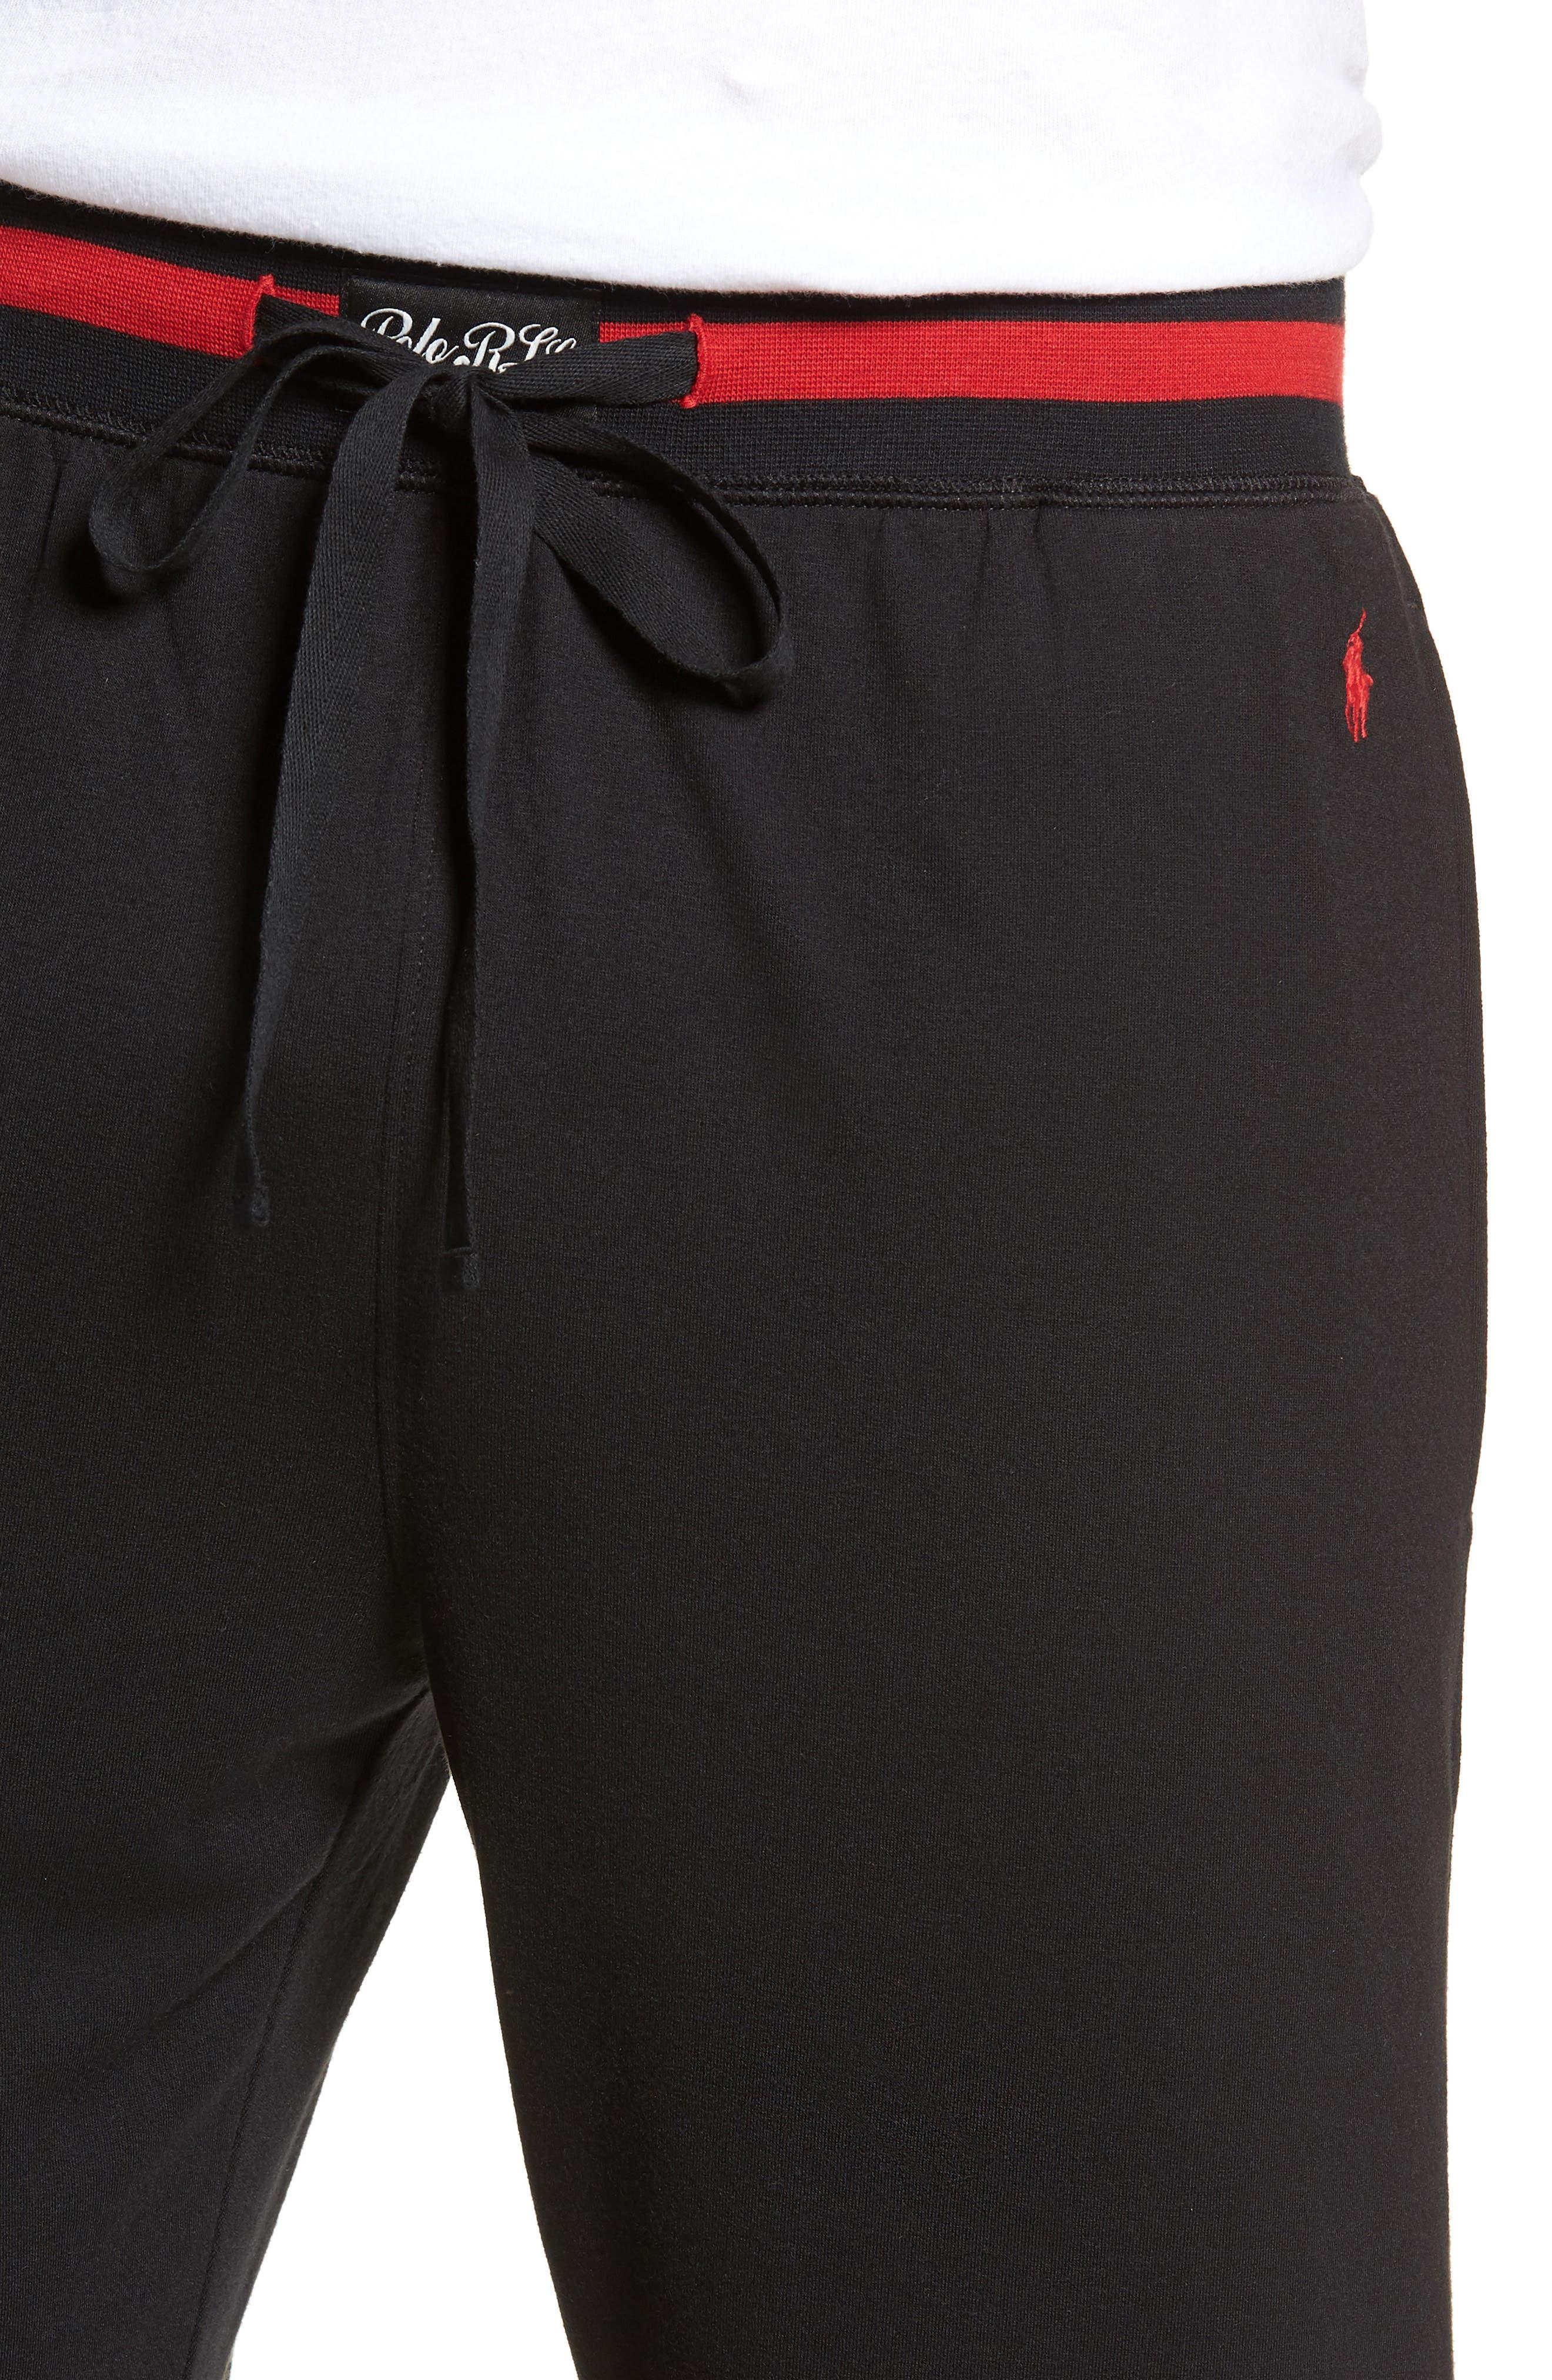 Jogger Pants,                             Alternate thumbnail 4, color,                             POLO BLACK